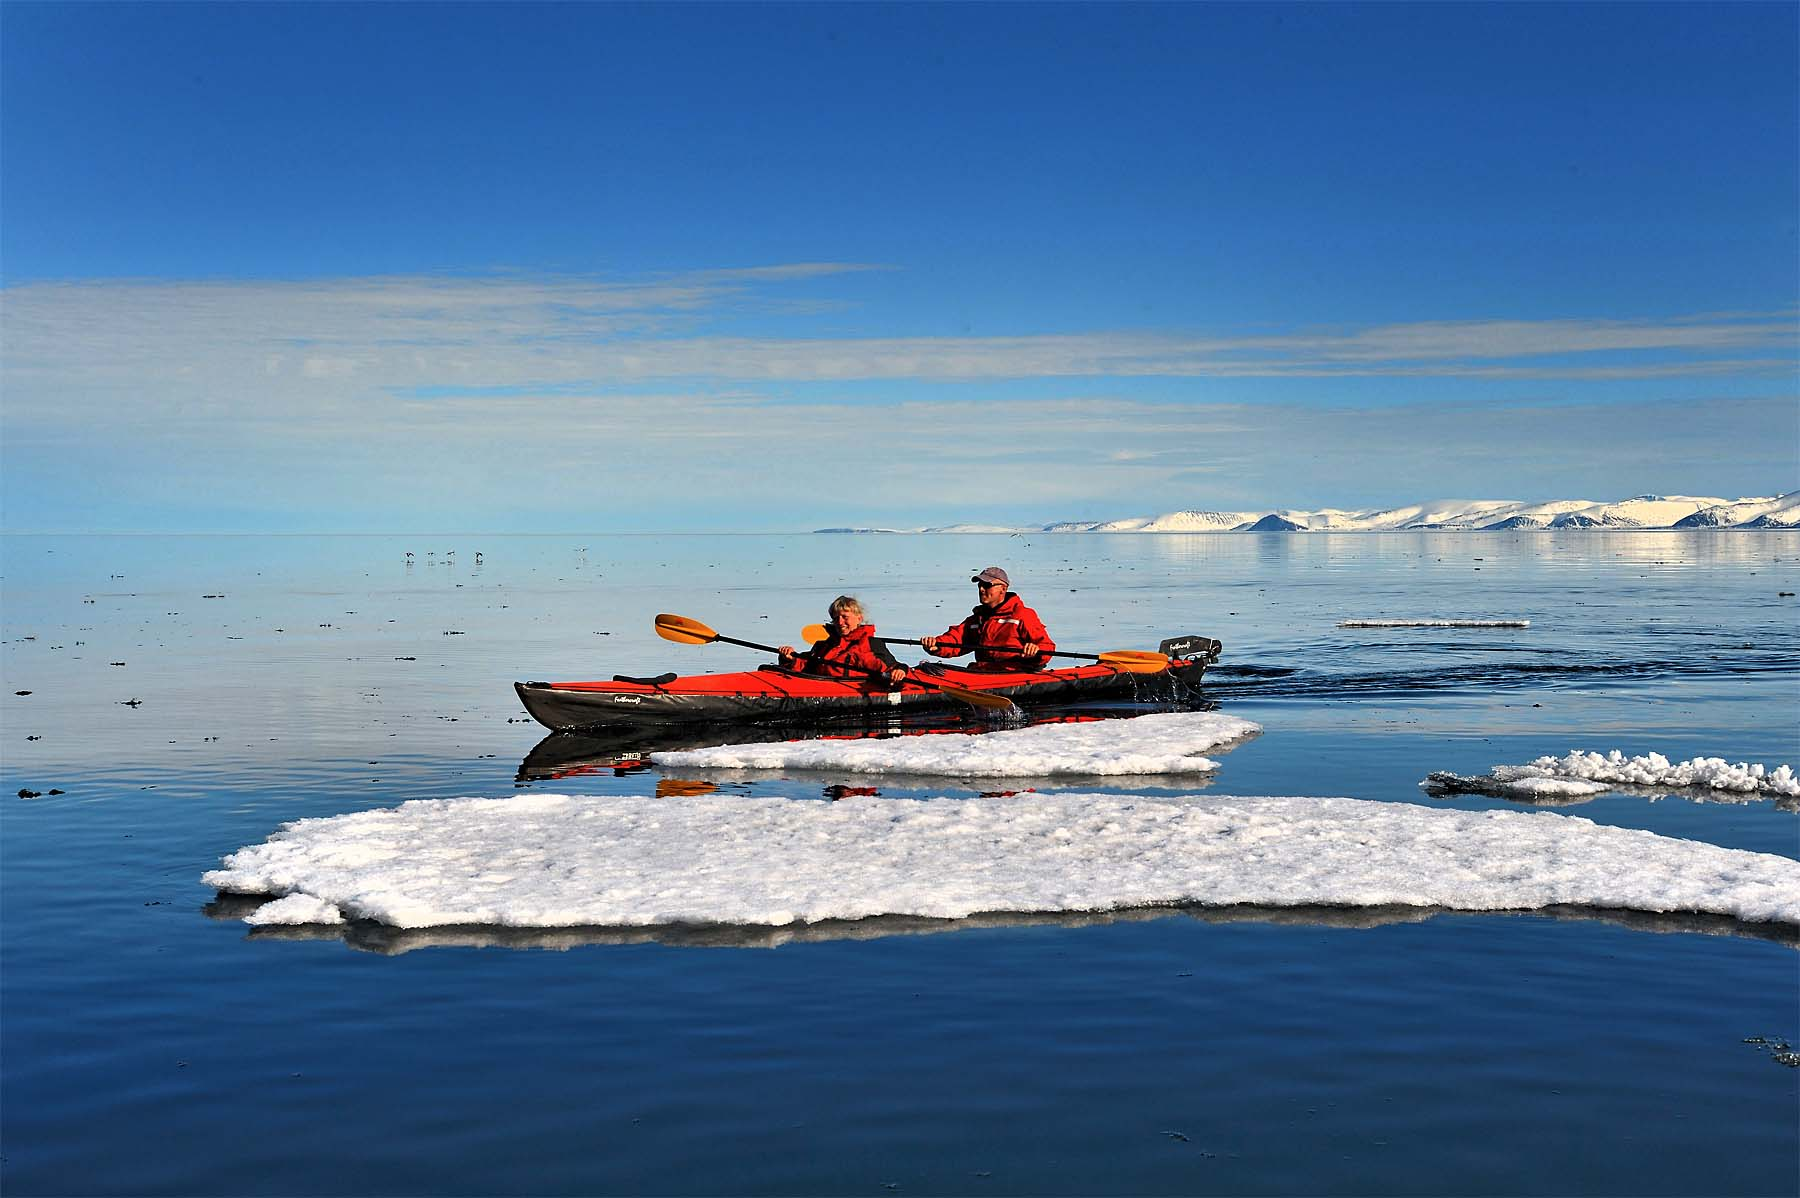 Polarsea Adventures